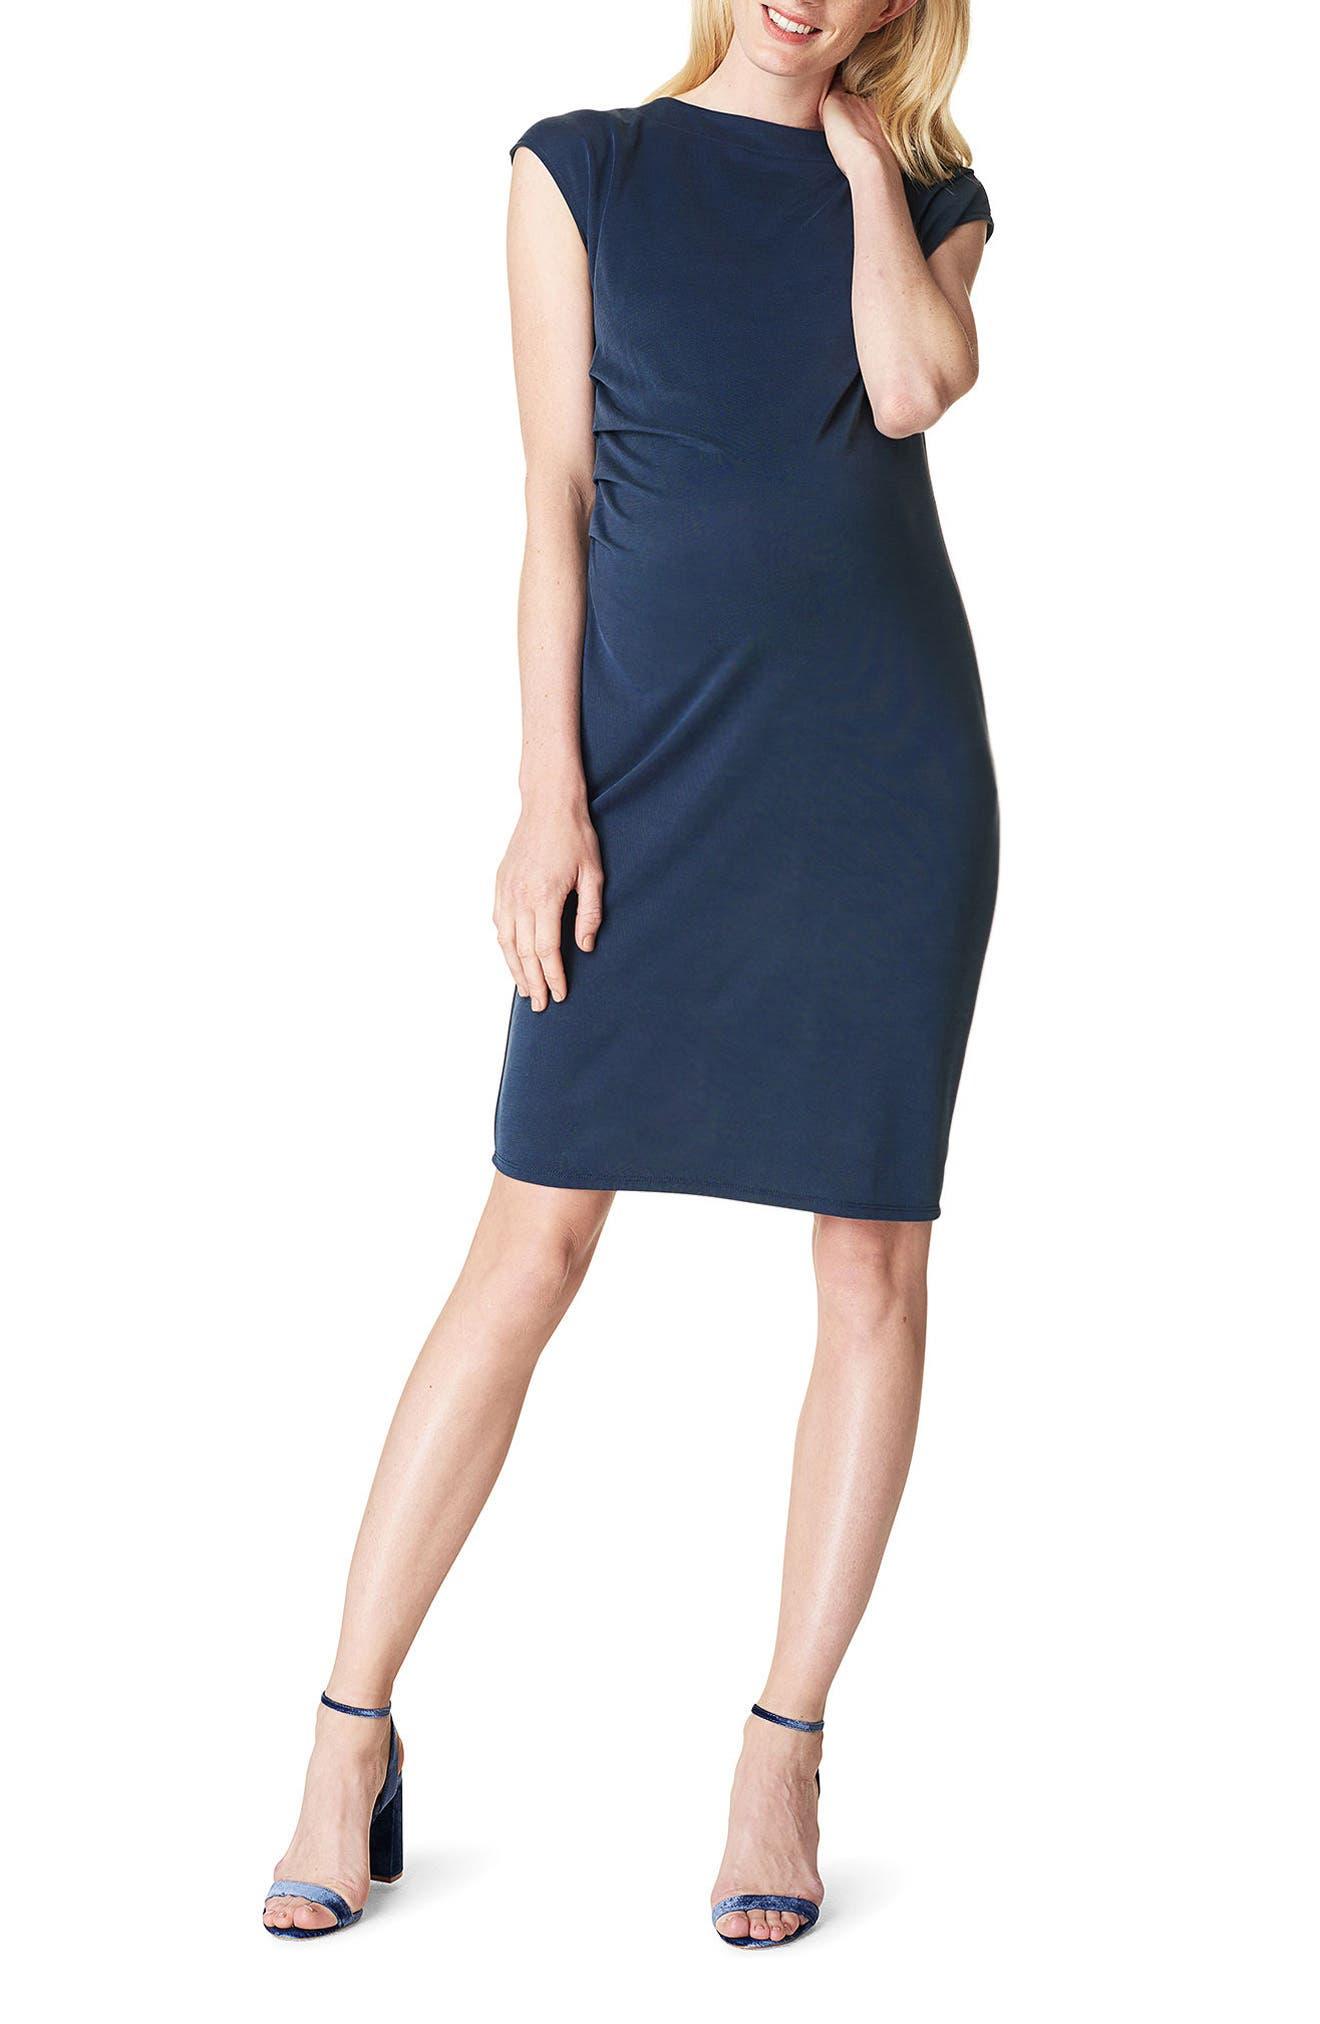 Annefleur Maternity Sheath Dress,                         Main,                         color, NAVY